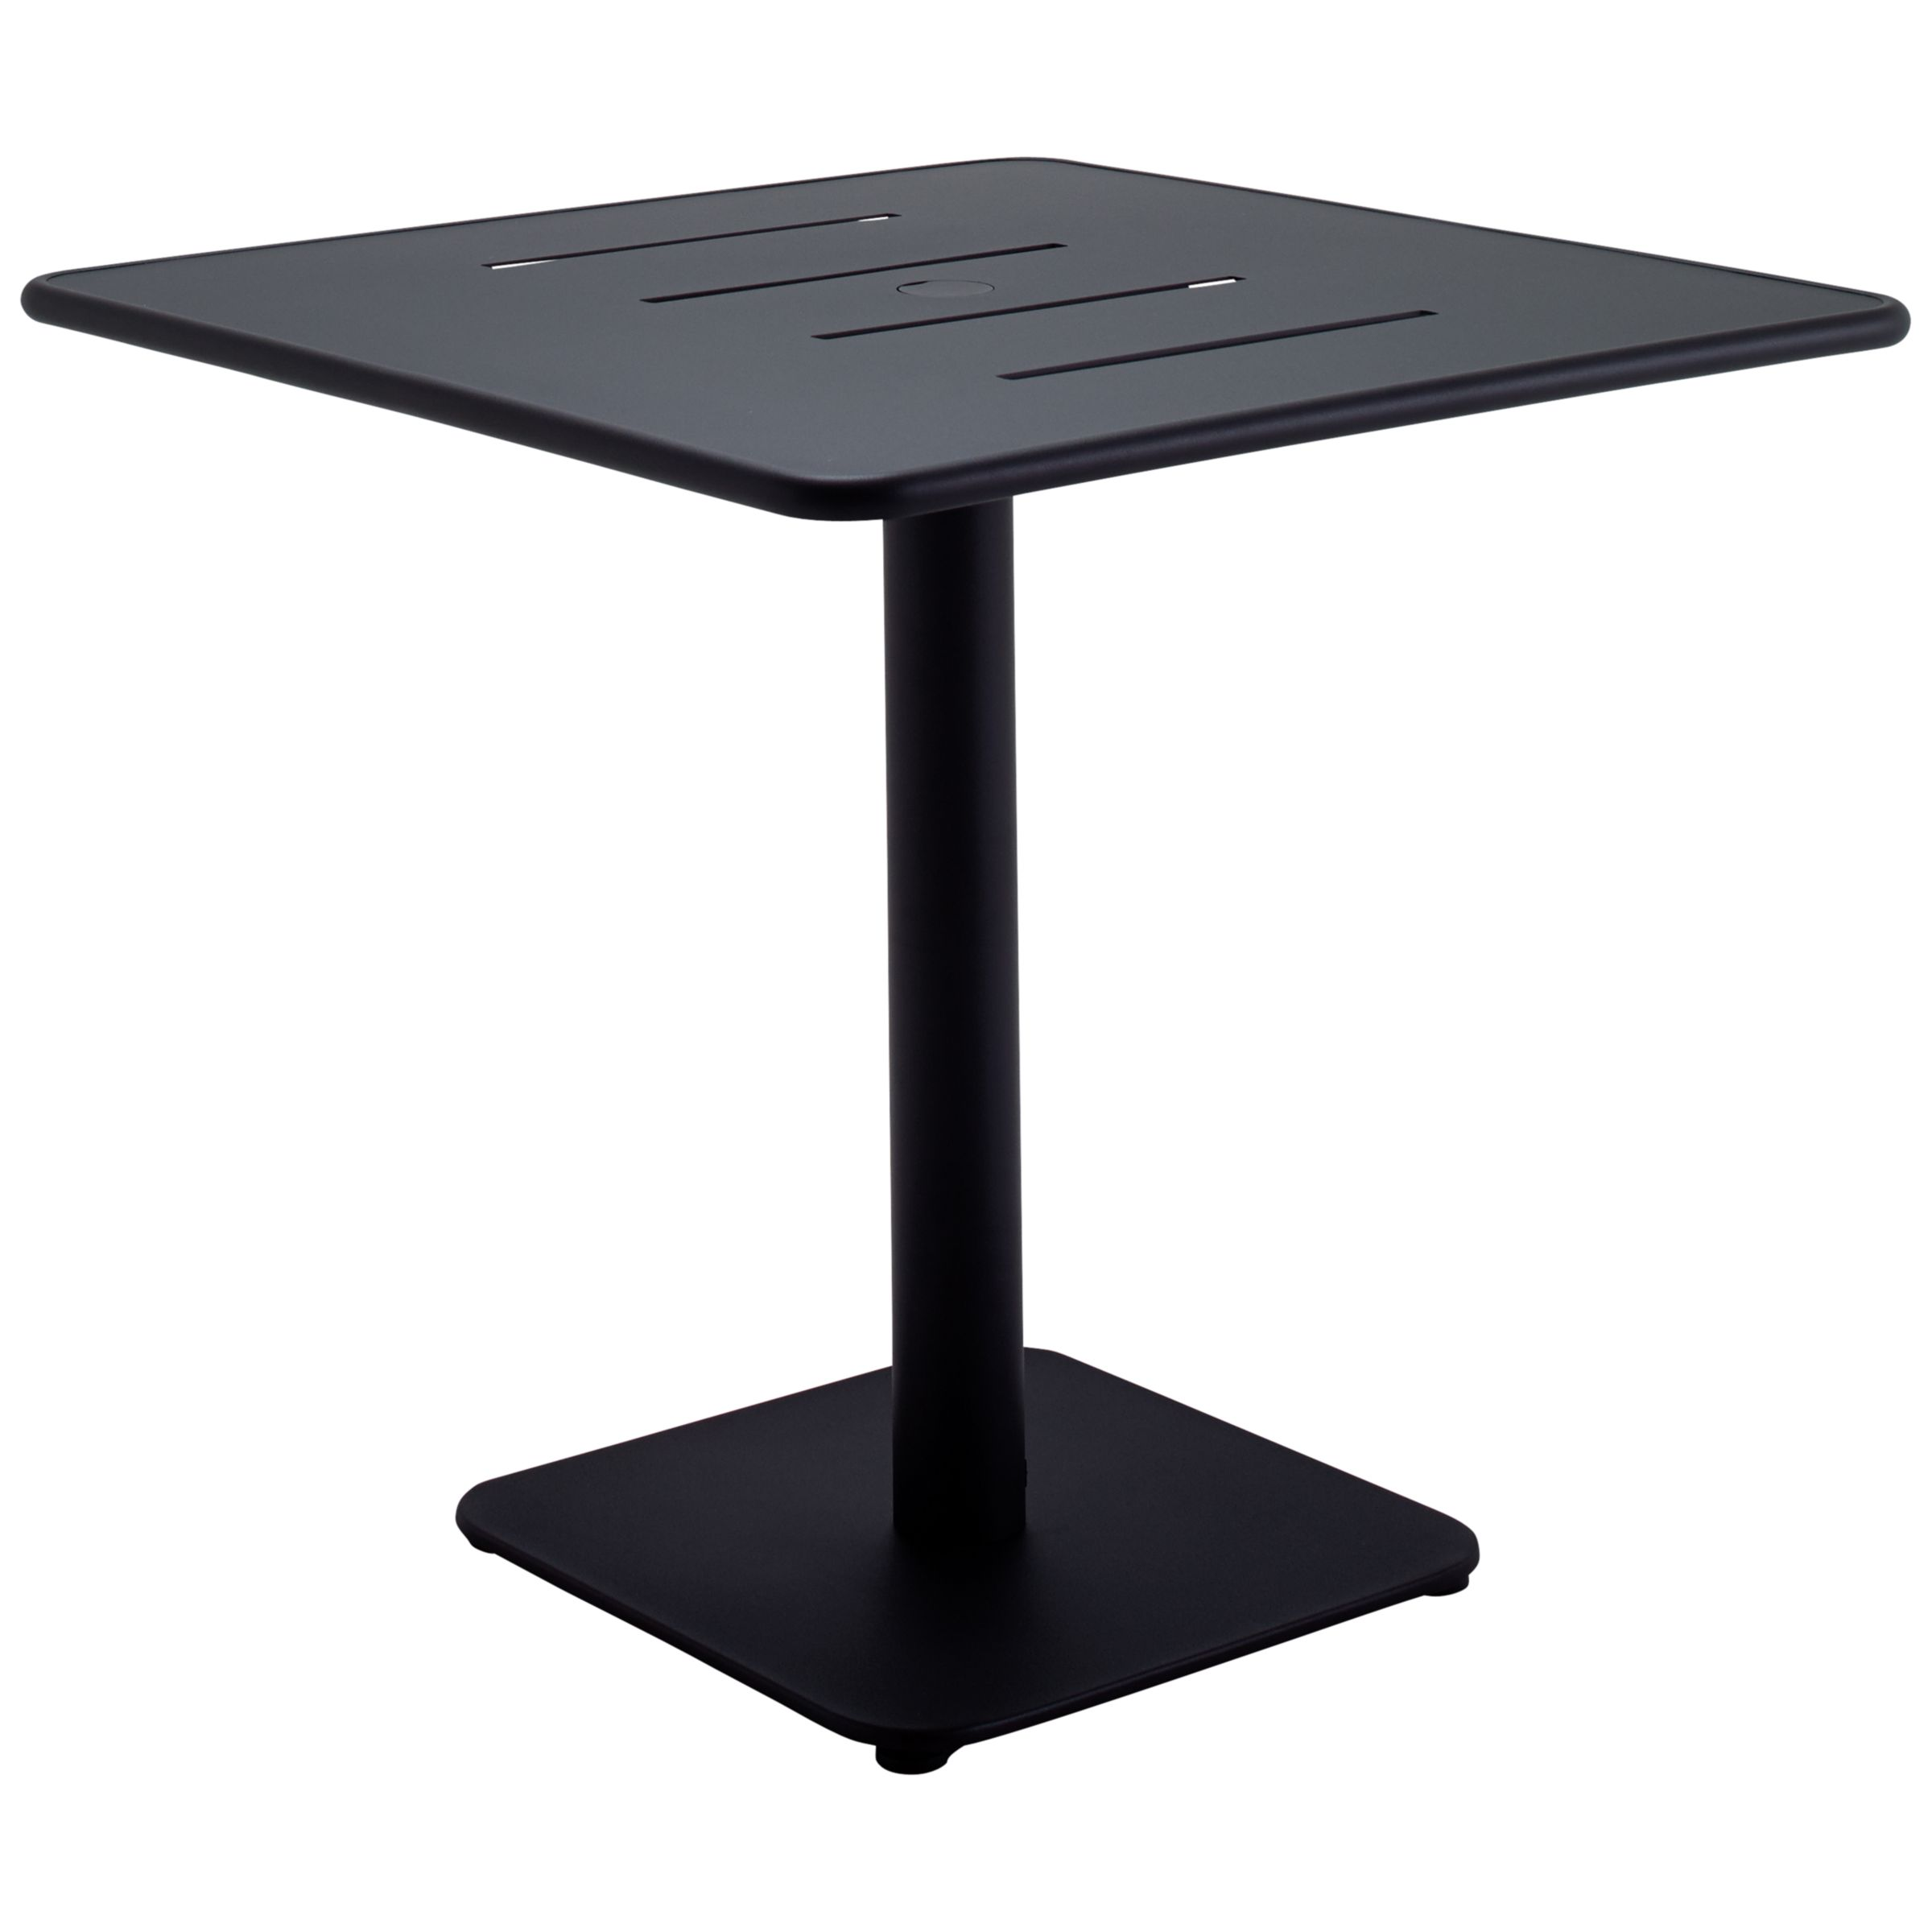 Gloster Nomad Square 80cm Pedestal Dining Table, Black